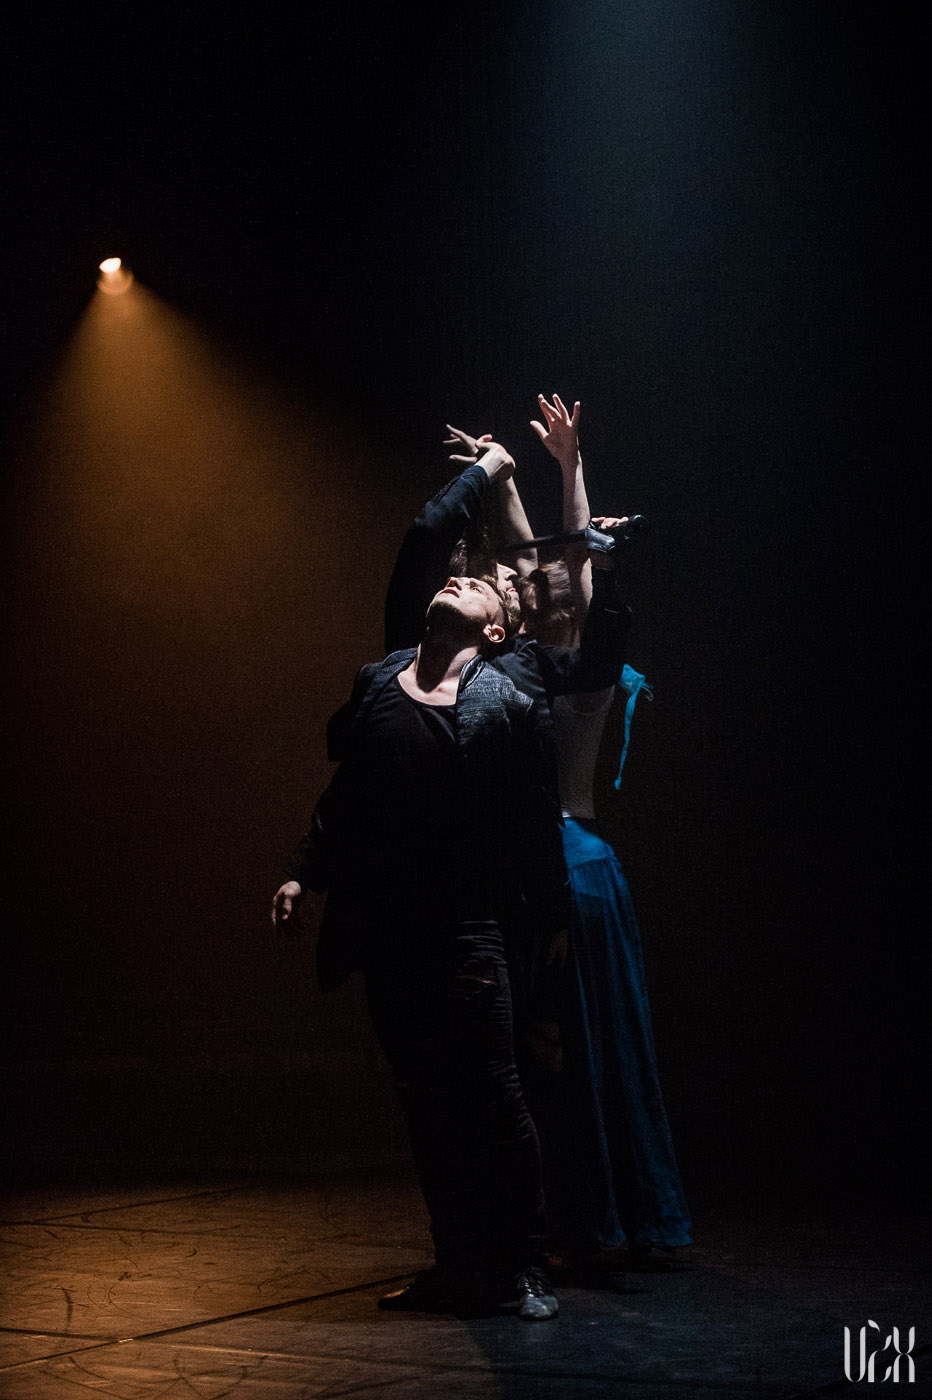 E.sabaliauskaite Vzx.lt Faustas Teatras Event 006